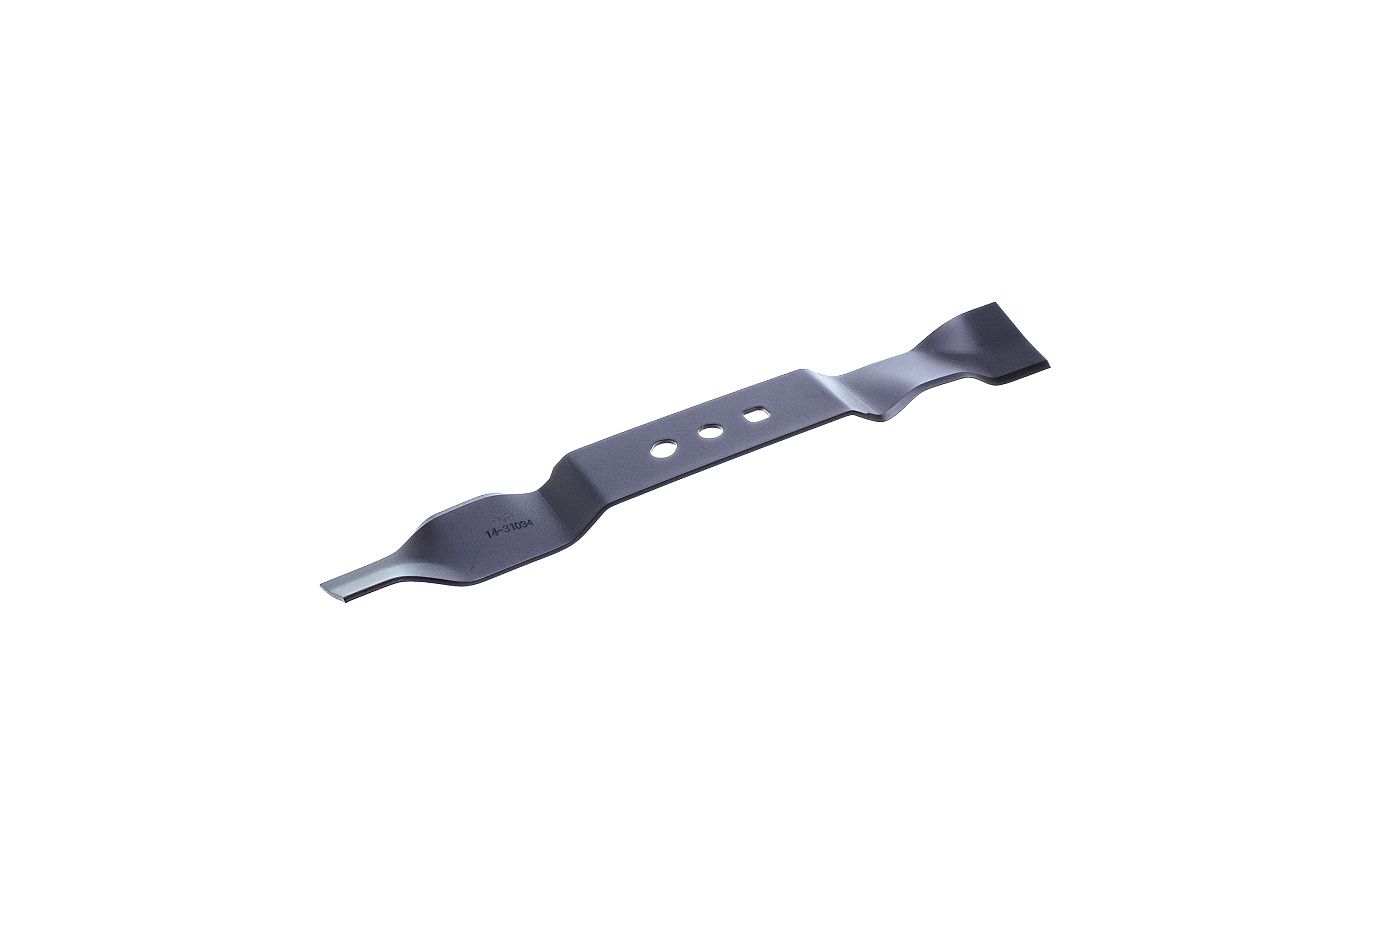 Nôž motorových kosačiek 46cm NAC URSUS mulčovací